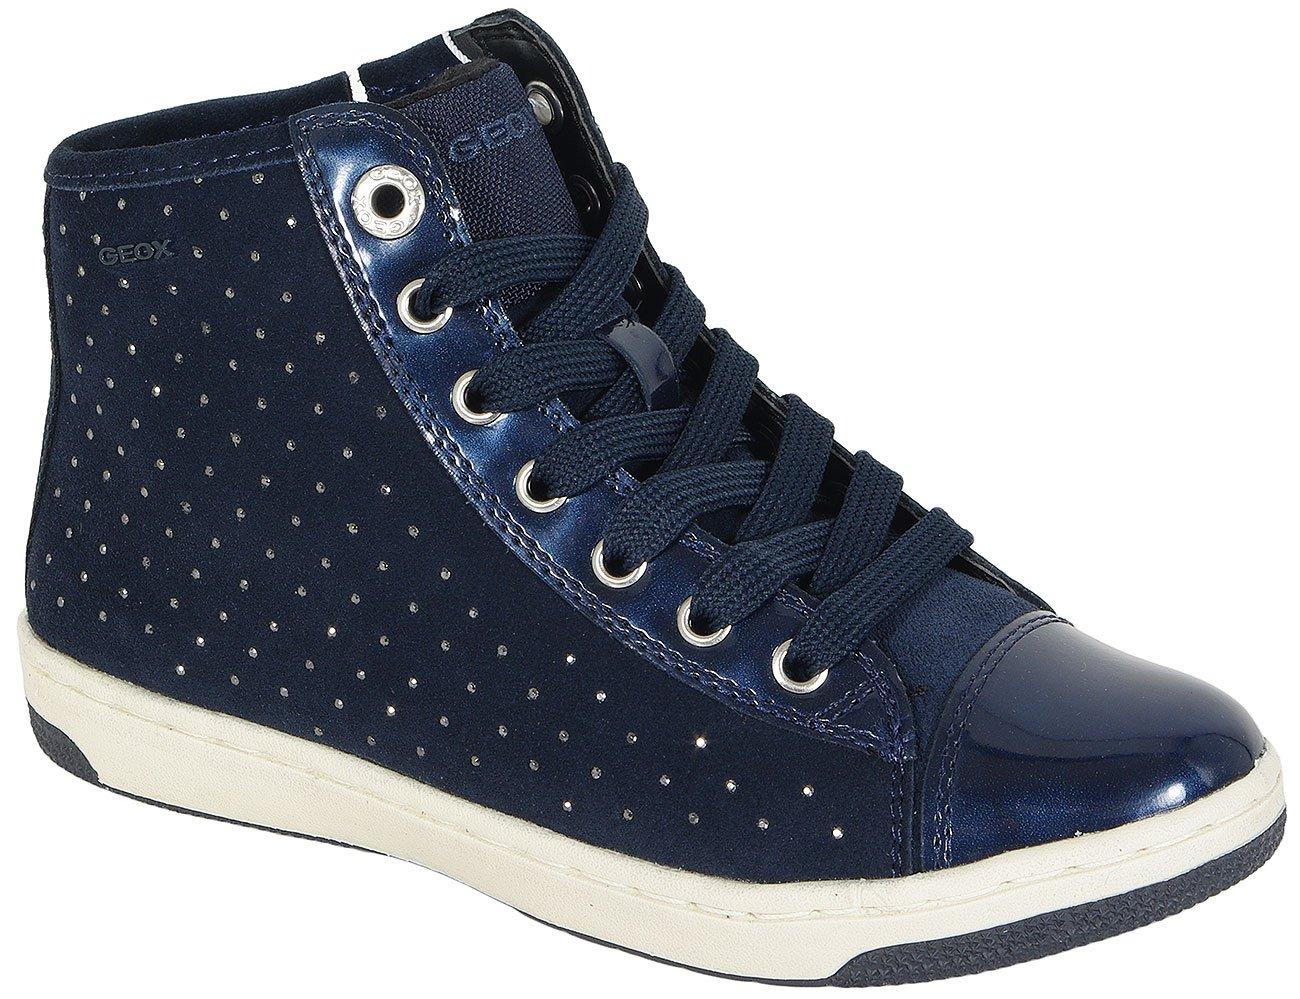 GEOX CREAMY A sneakers SUE+METAL.SYN.PAT NAVY